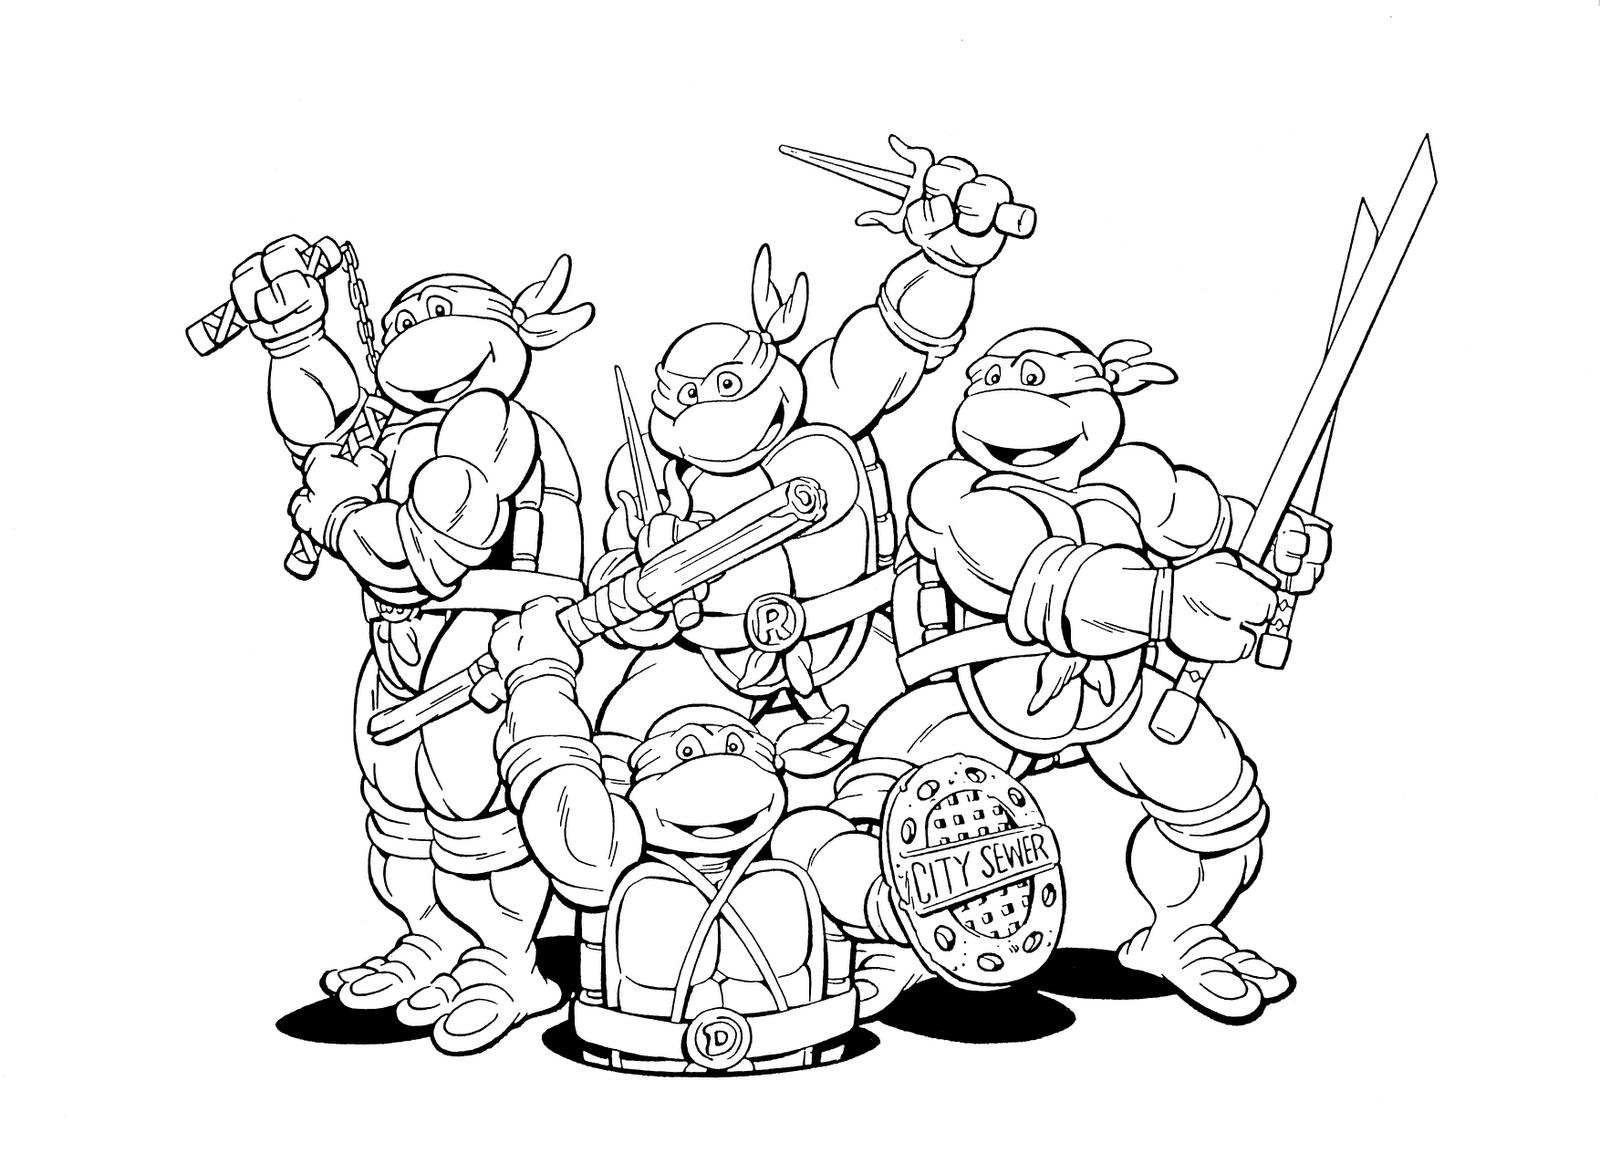 Free ninja turtle printable coloring pages ~ Ninja Turtle Coloring Pages - Free Printable Pictures ...